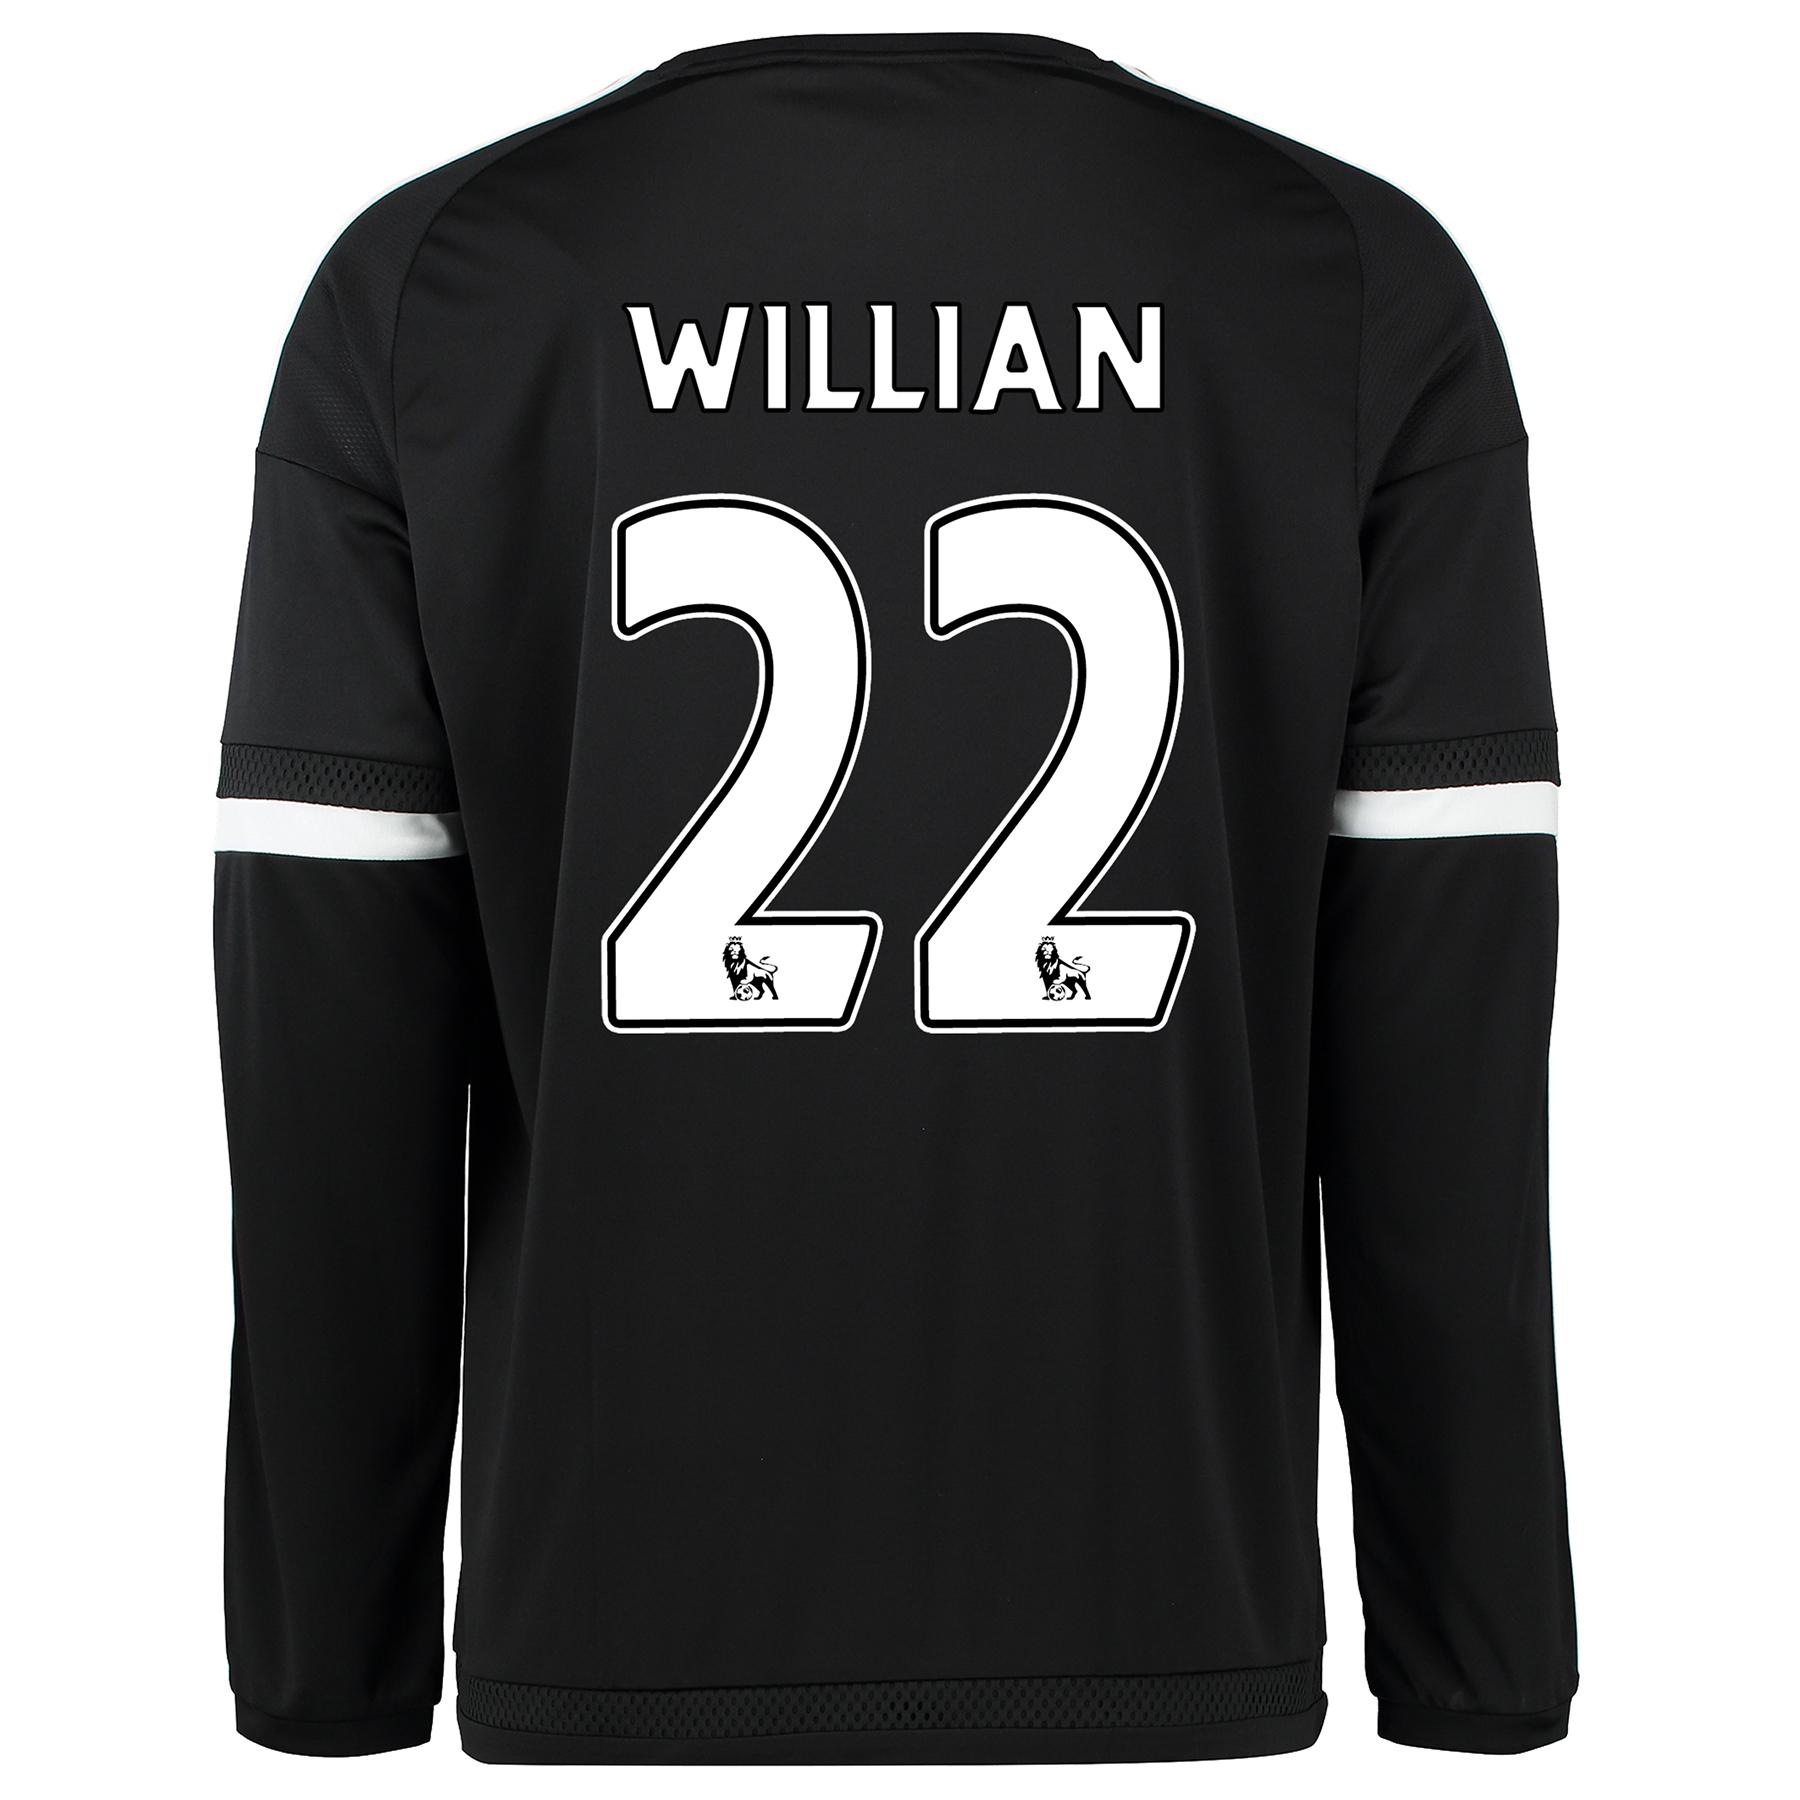 Chelsea Third Shirt 2015/16 - Long Sleeve Black with Willian 22 printi